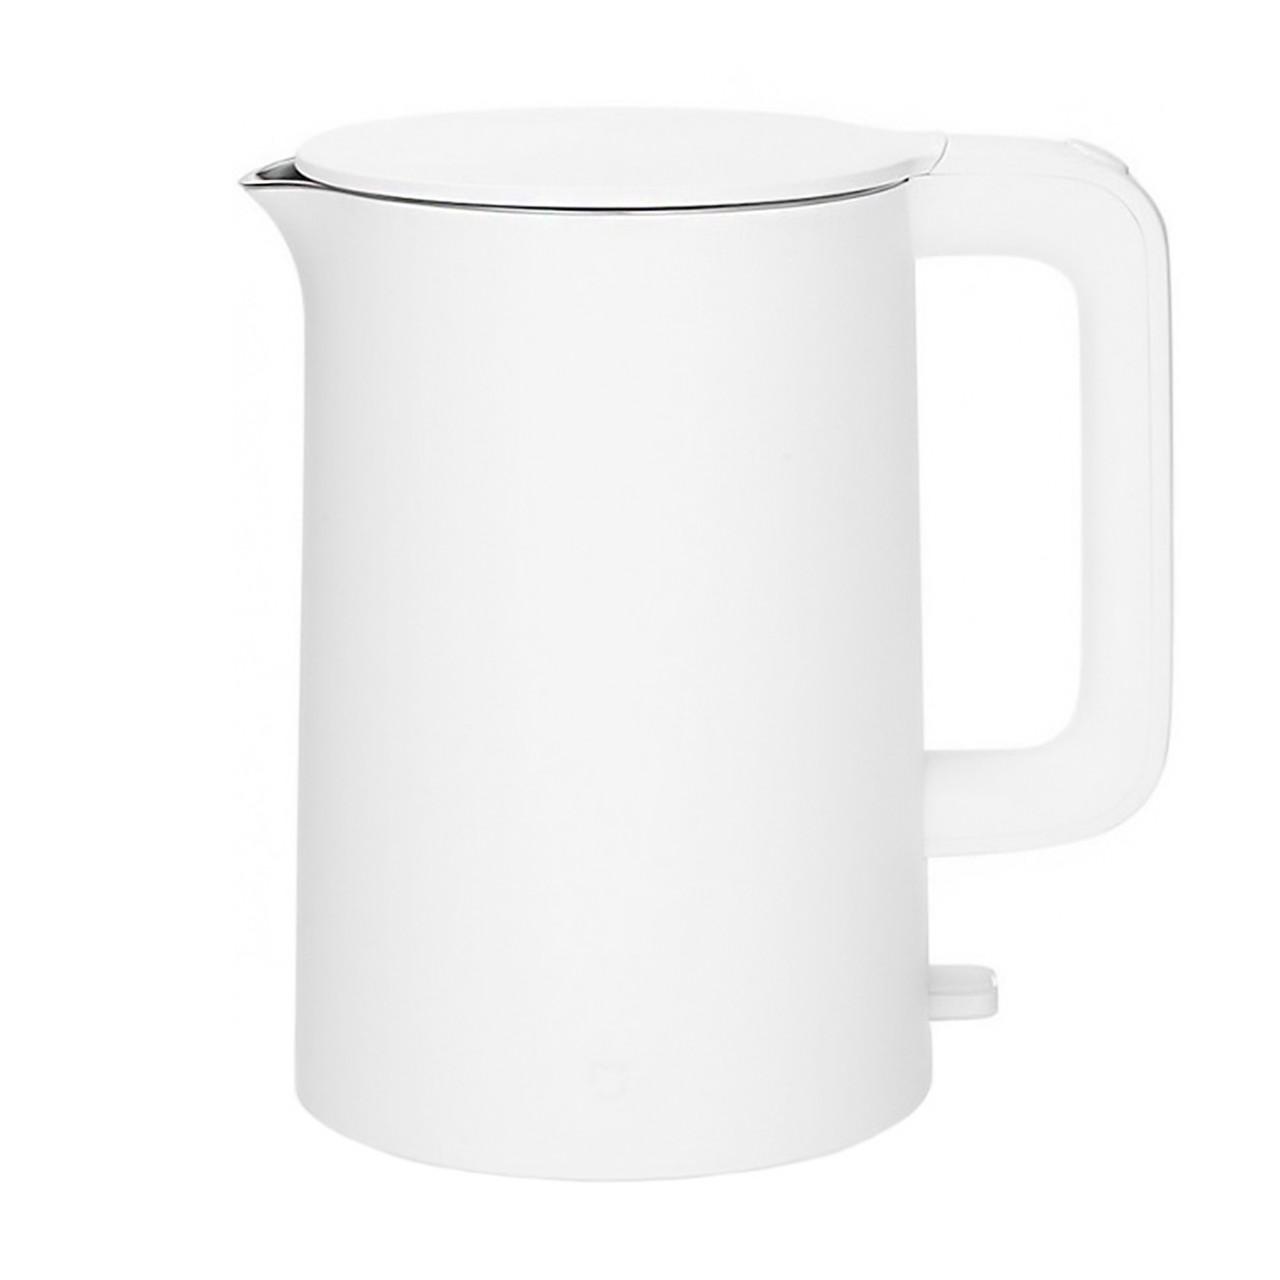 Электрический чайник Xiaomi Mi Electric Kettle, White